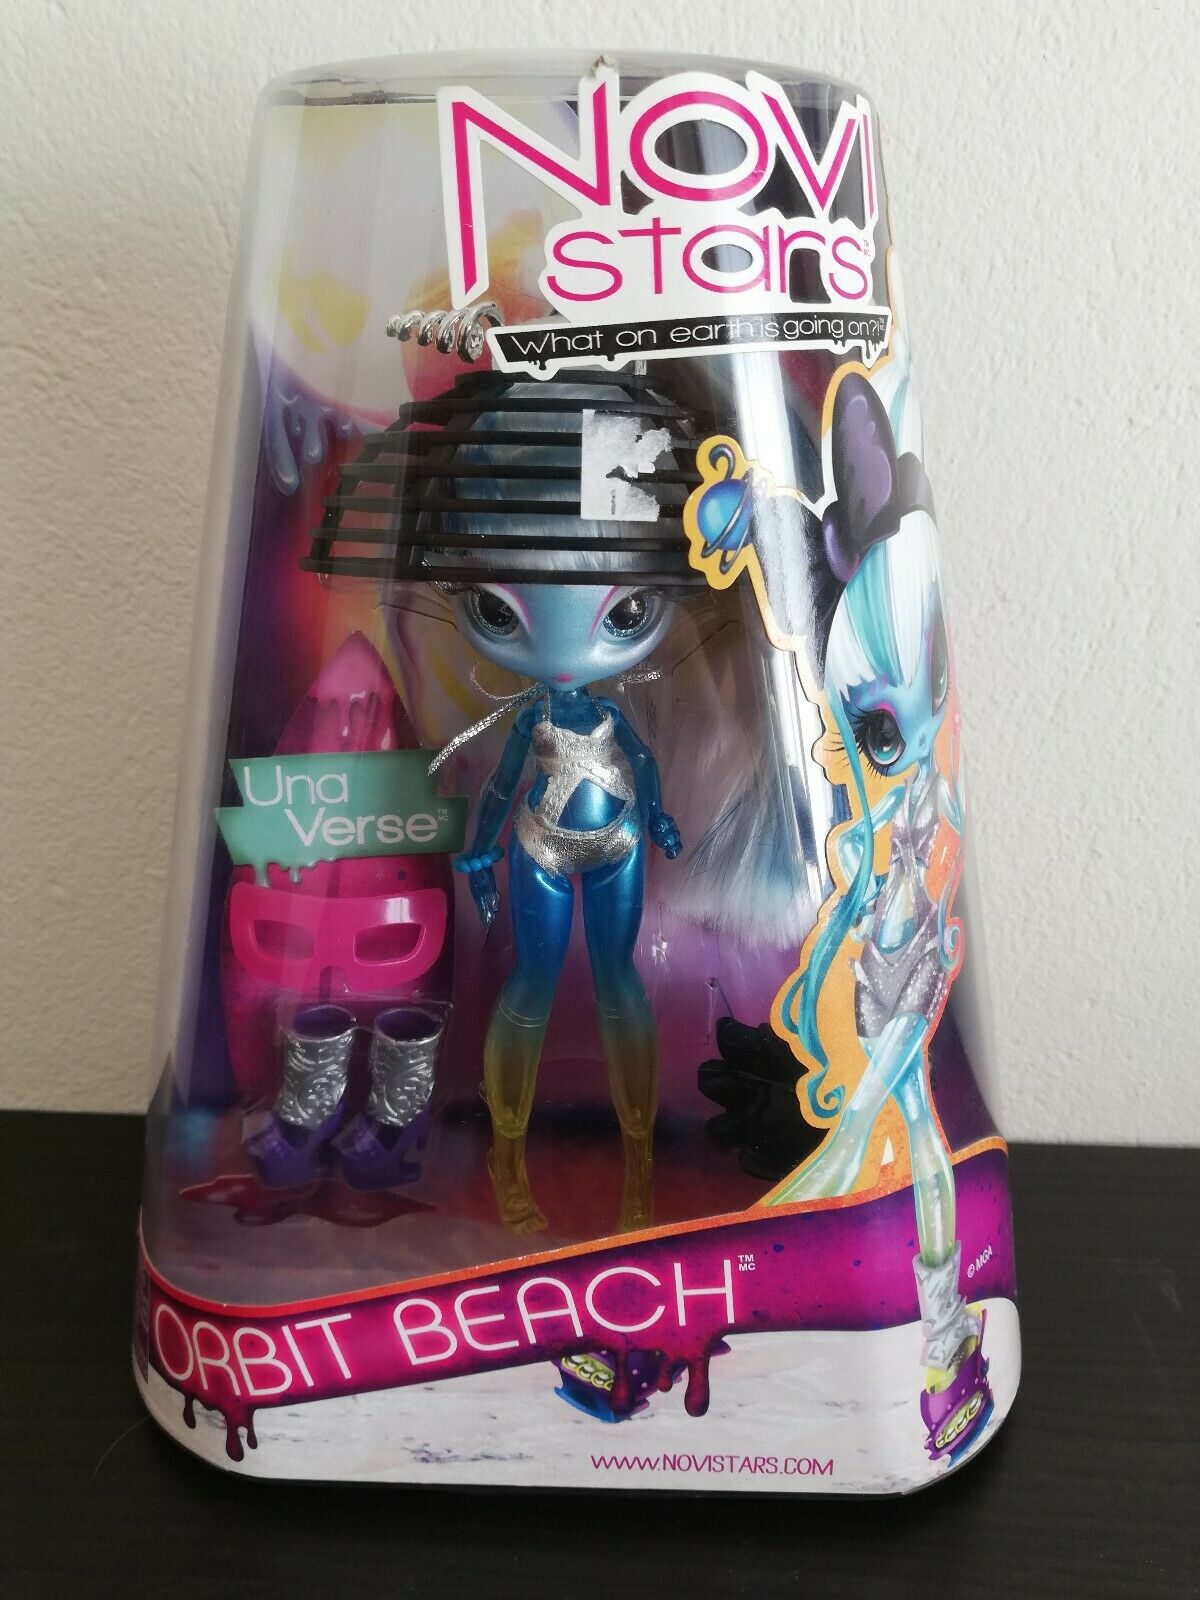 Novi Stars Una Verse Orbit Beach MGA Entertainment Hard to Find NEW